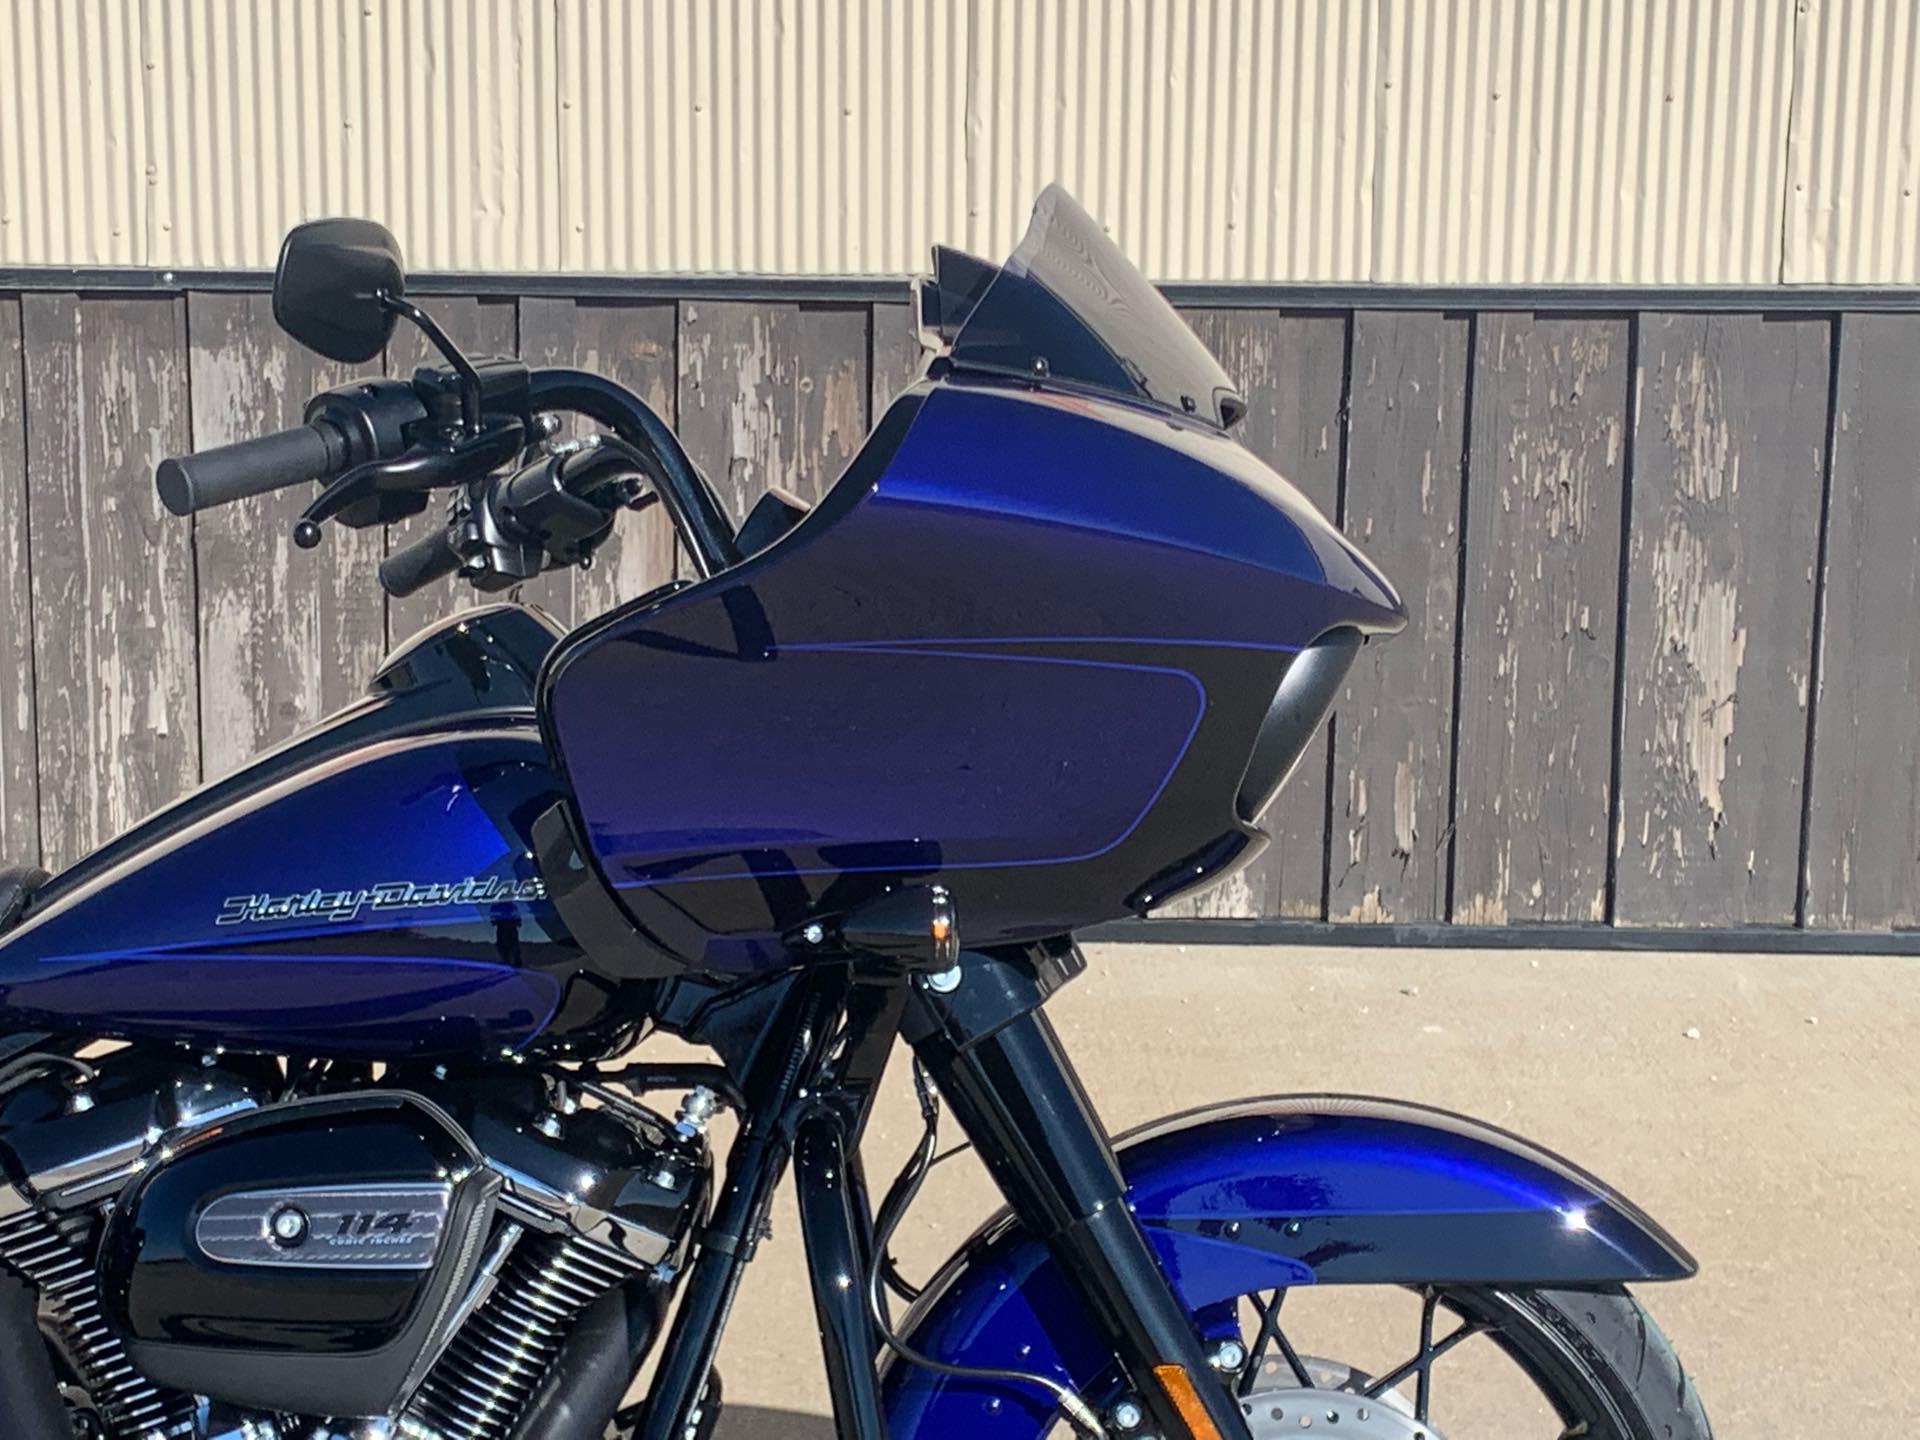 2020 Harley-Davidson Touring Road Glide Special at Loess Hills Harley-Davidson